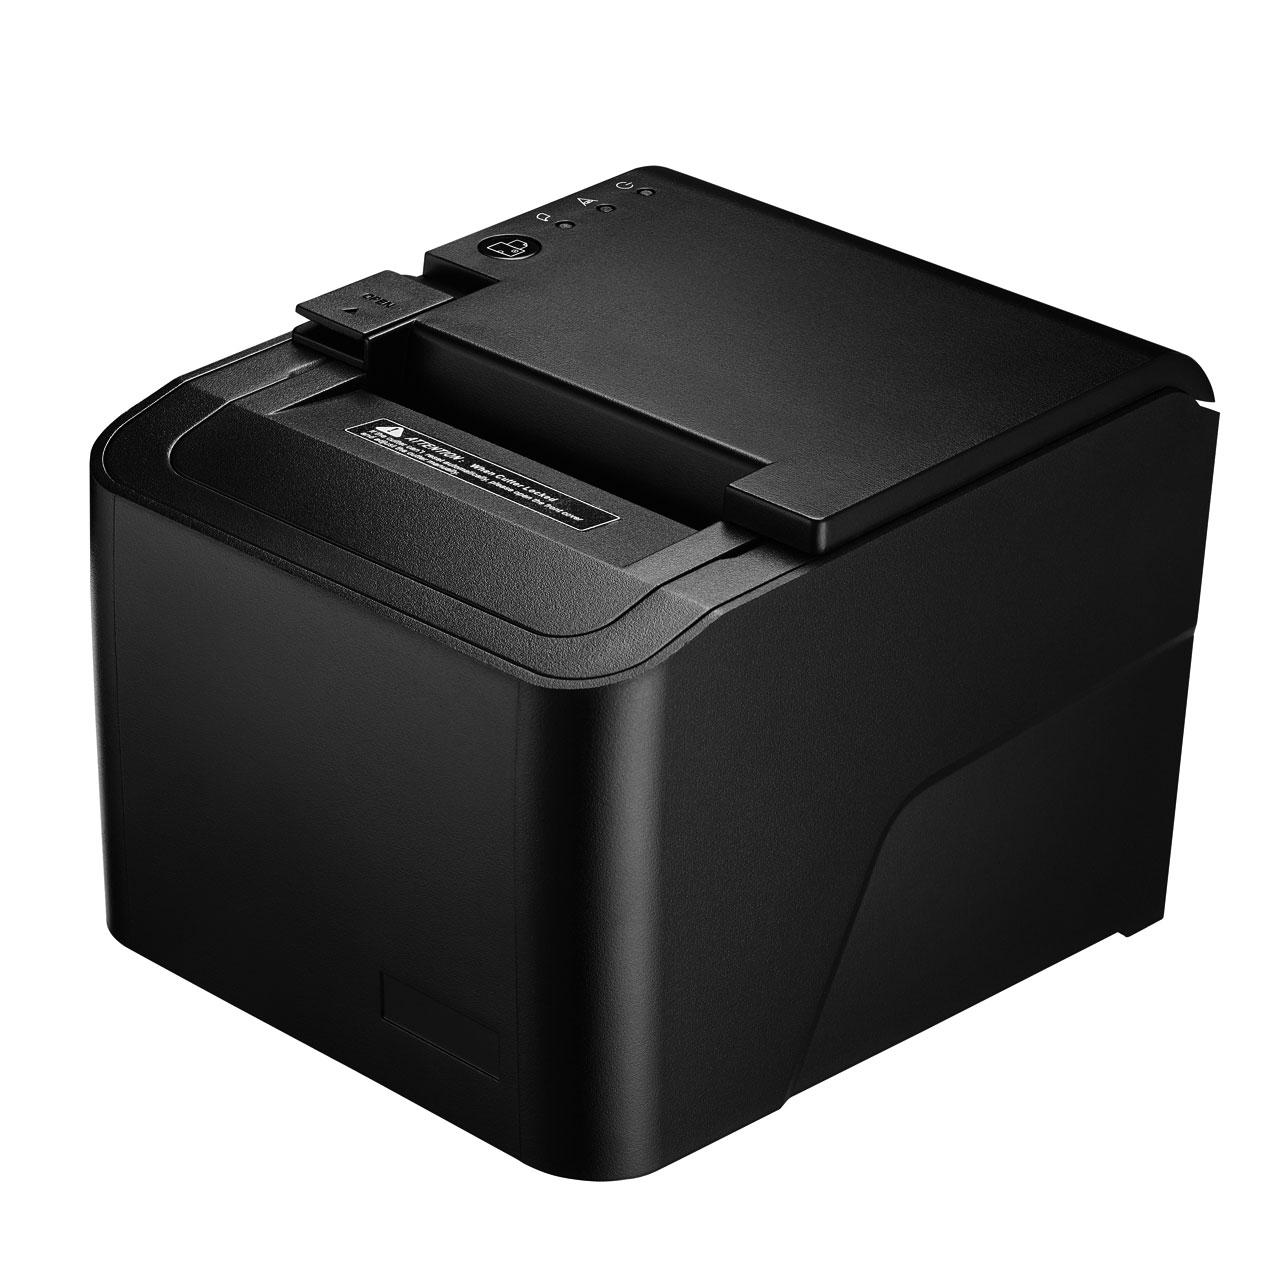 80mm Multi-I/O, 250 mm/sec Print Speed Thermal Receipt Printer PRP-250C